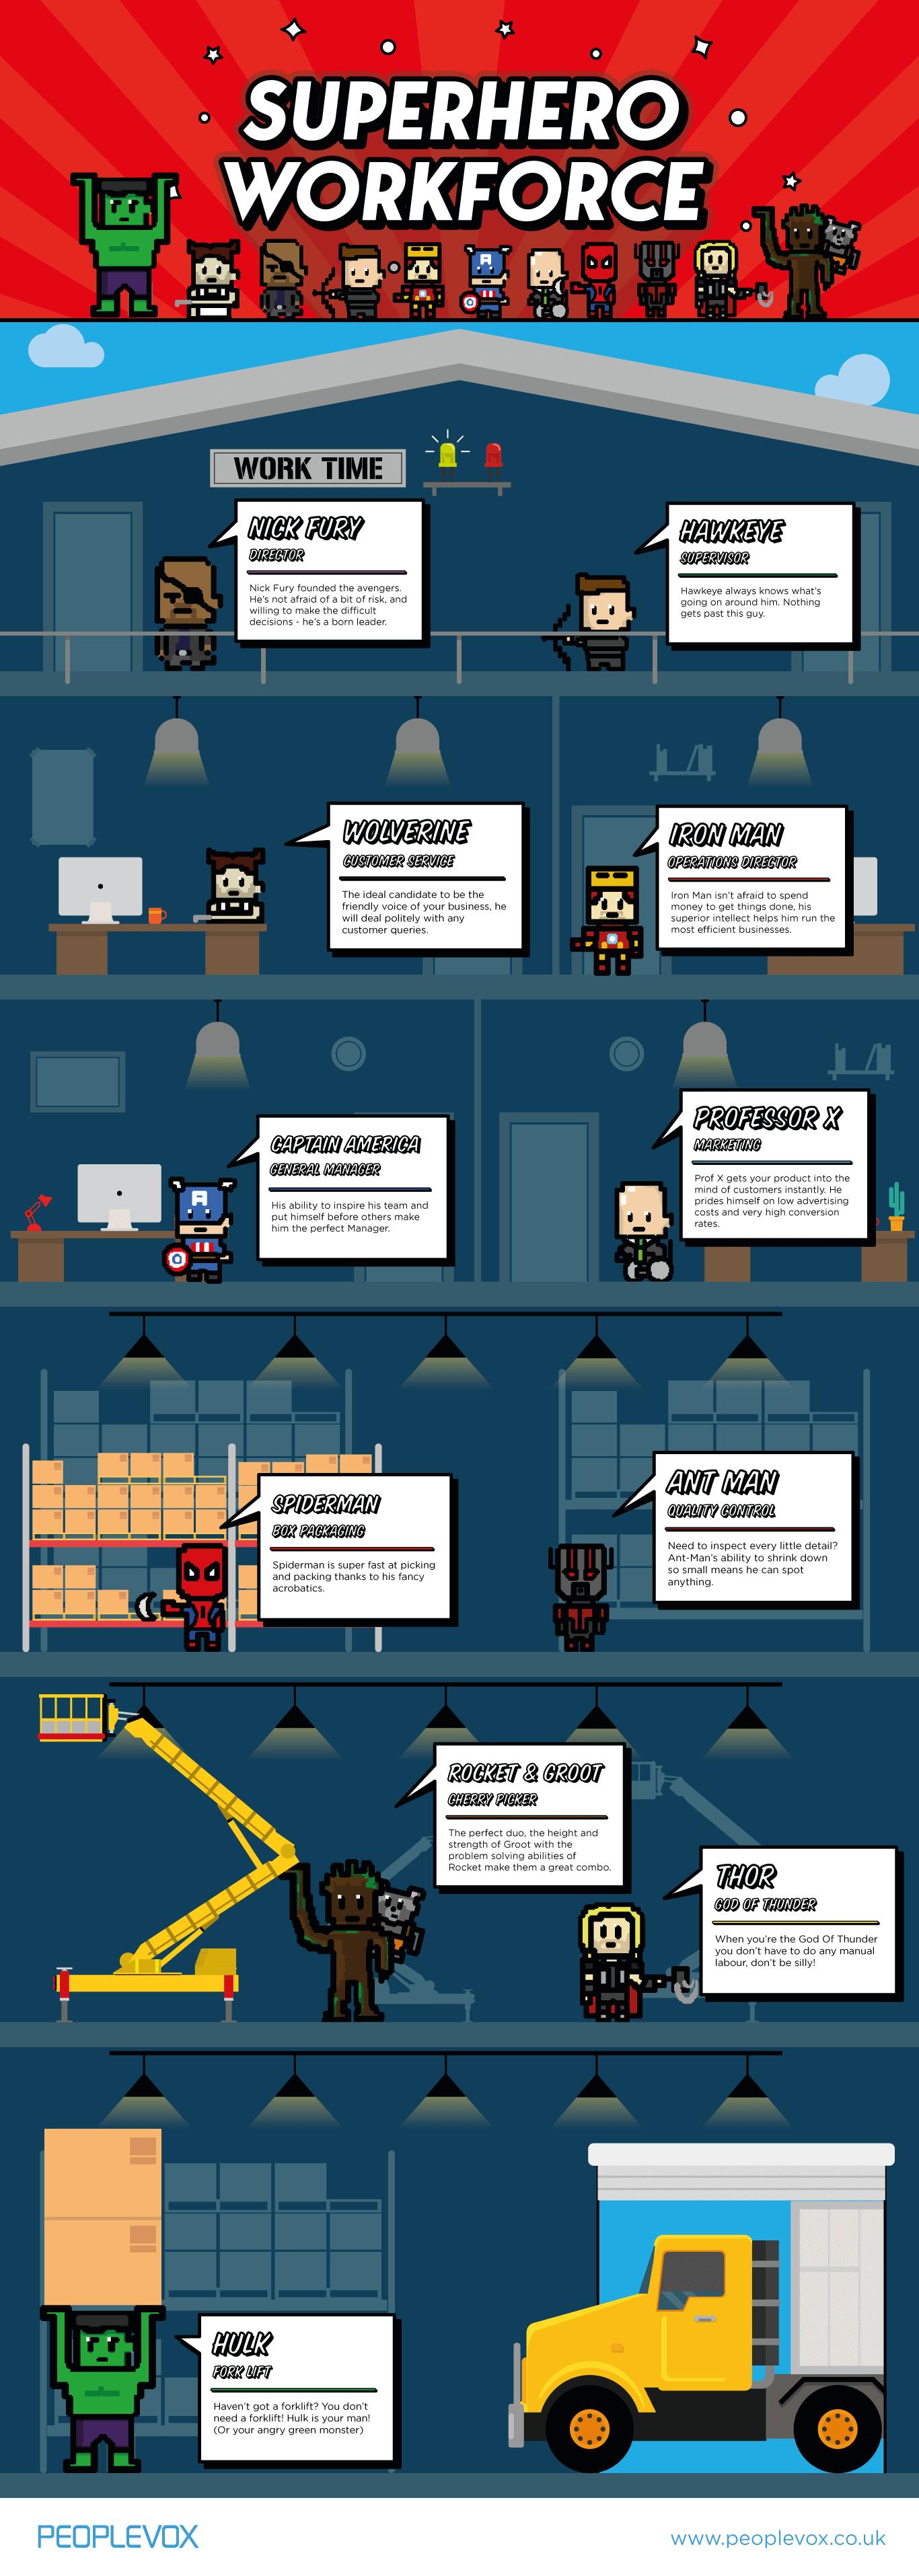 Superhero-work-force